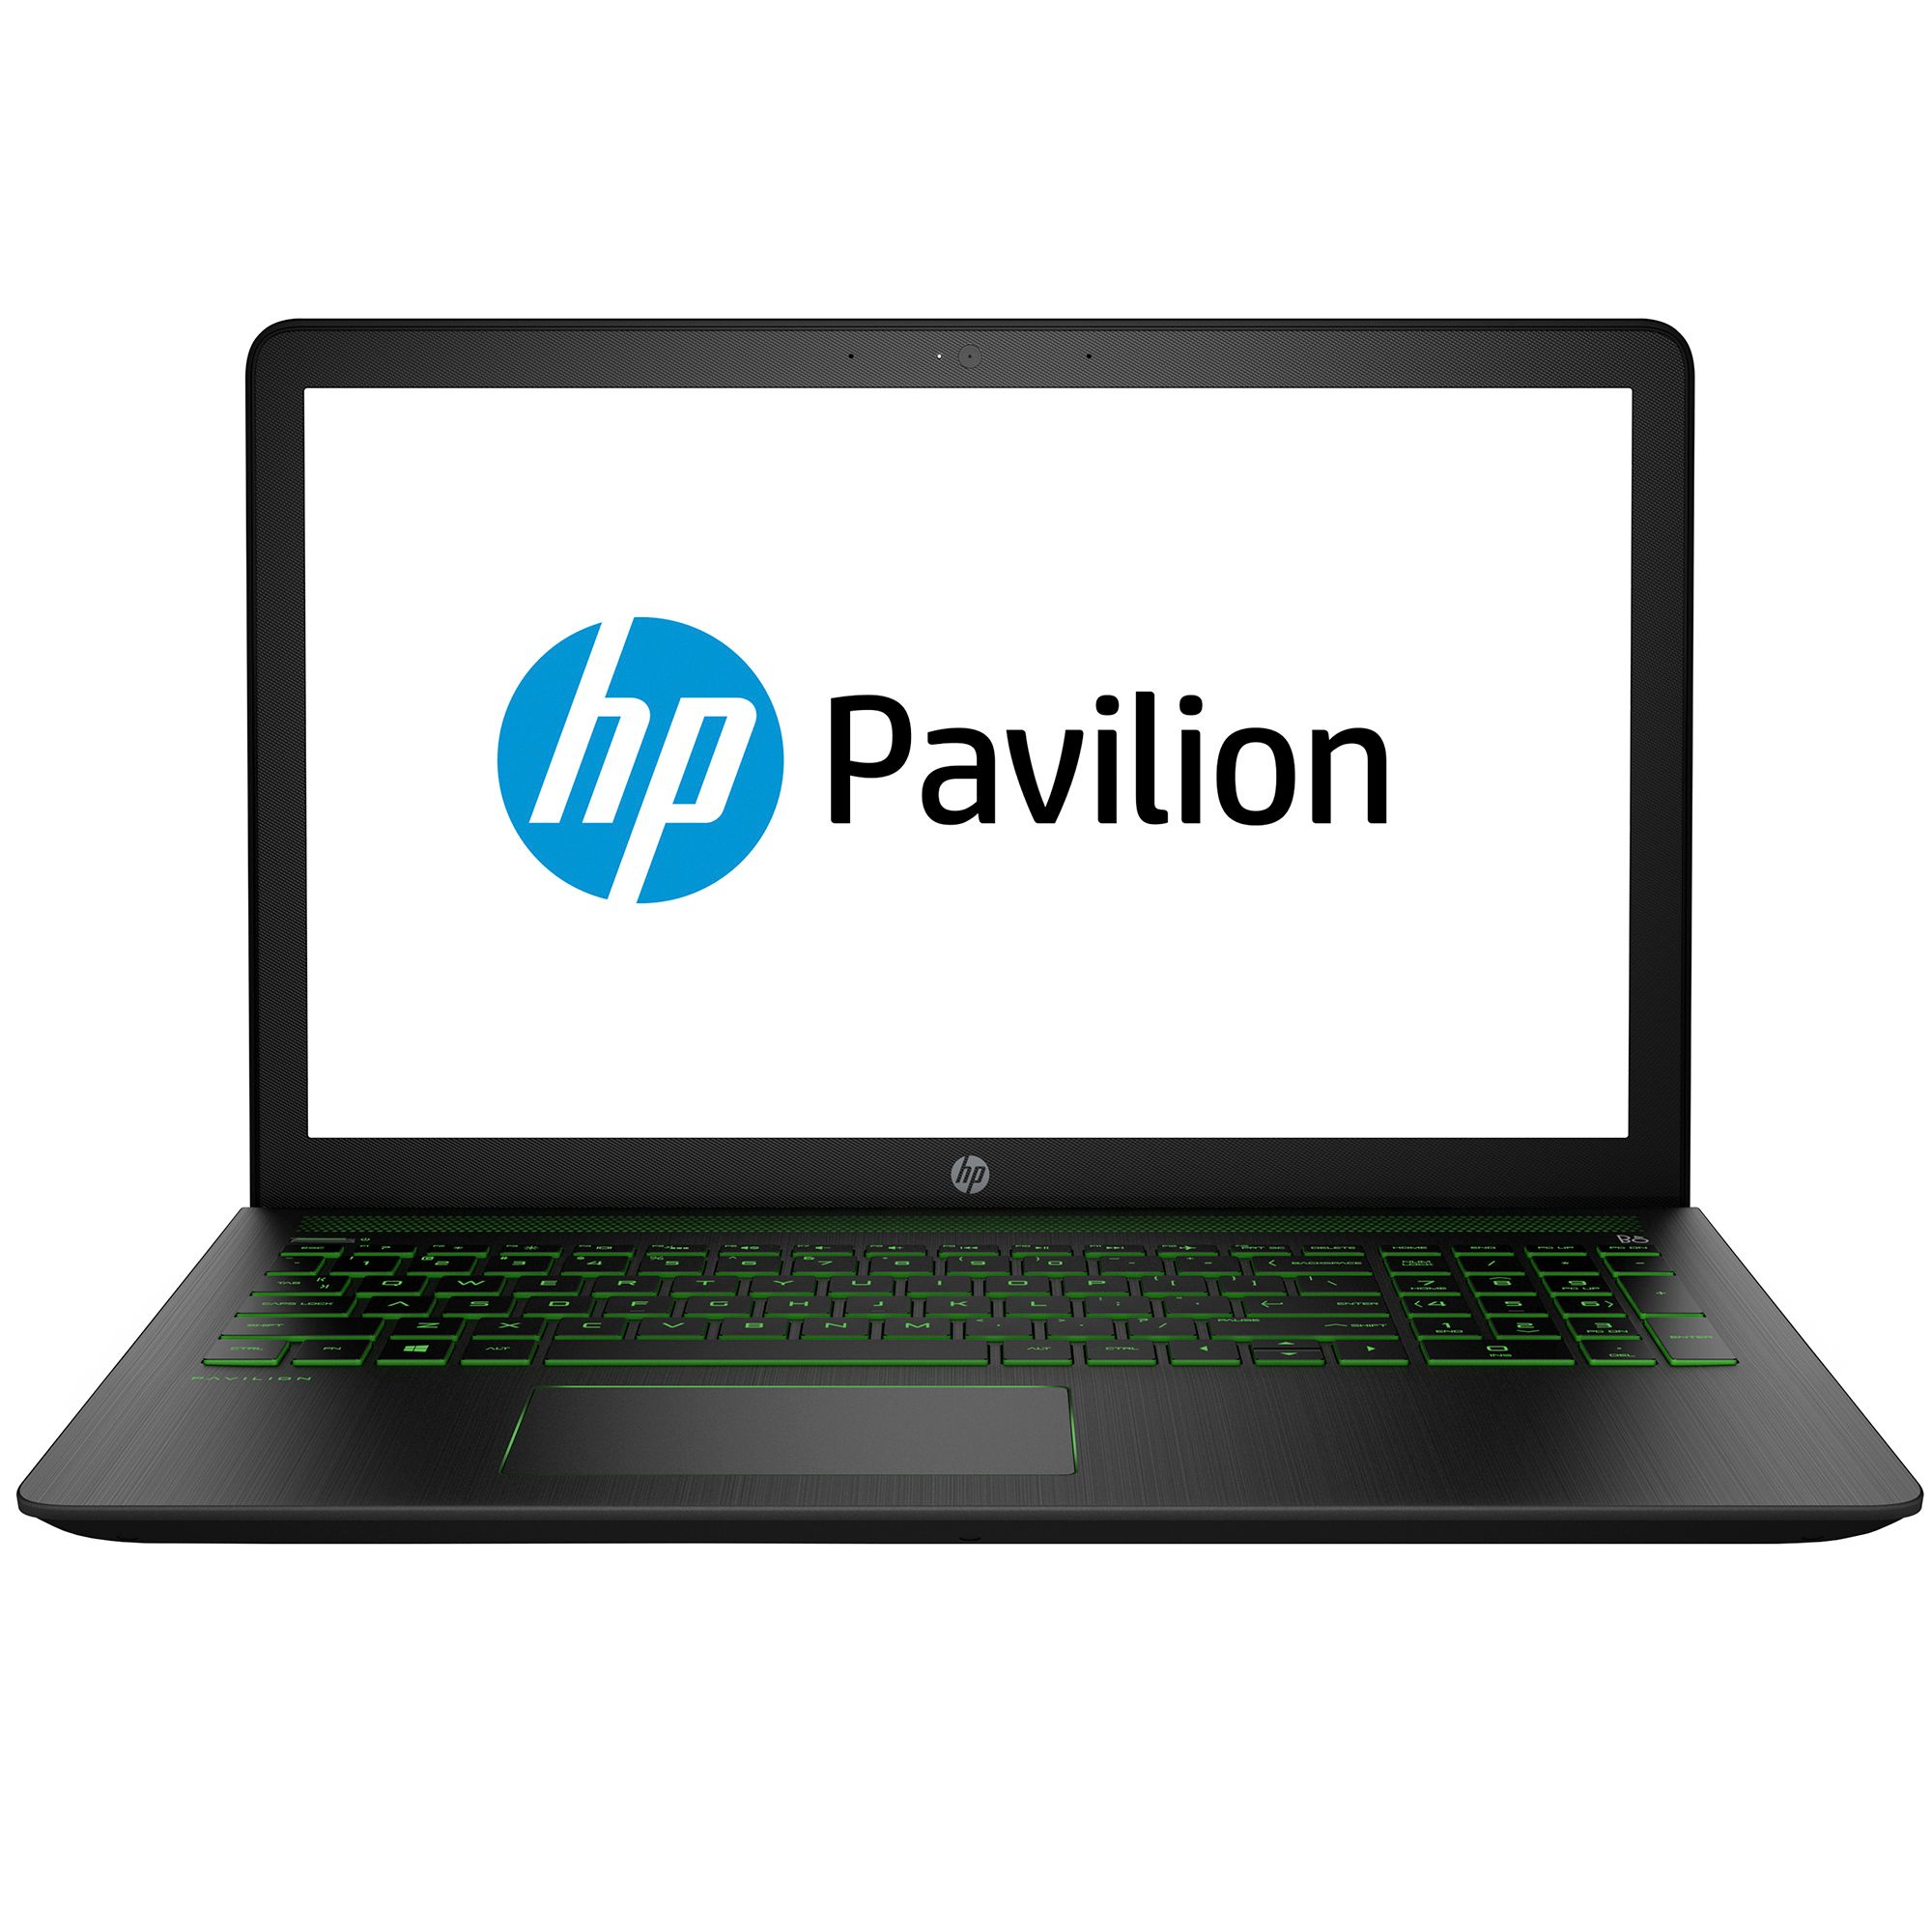 Notebook HP Pavilion Power 15.6 Full HD Intel Core i7-7700HQ GTX 1050-4GB RAM 8GB HDD 1TB FreeDOS